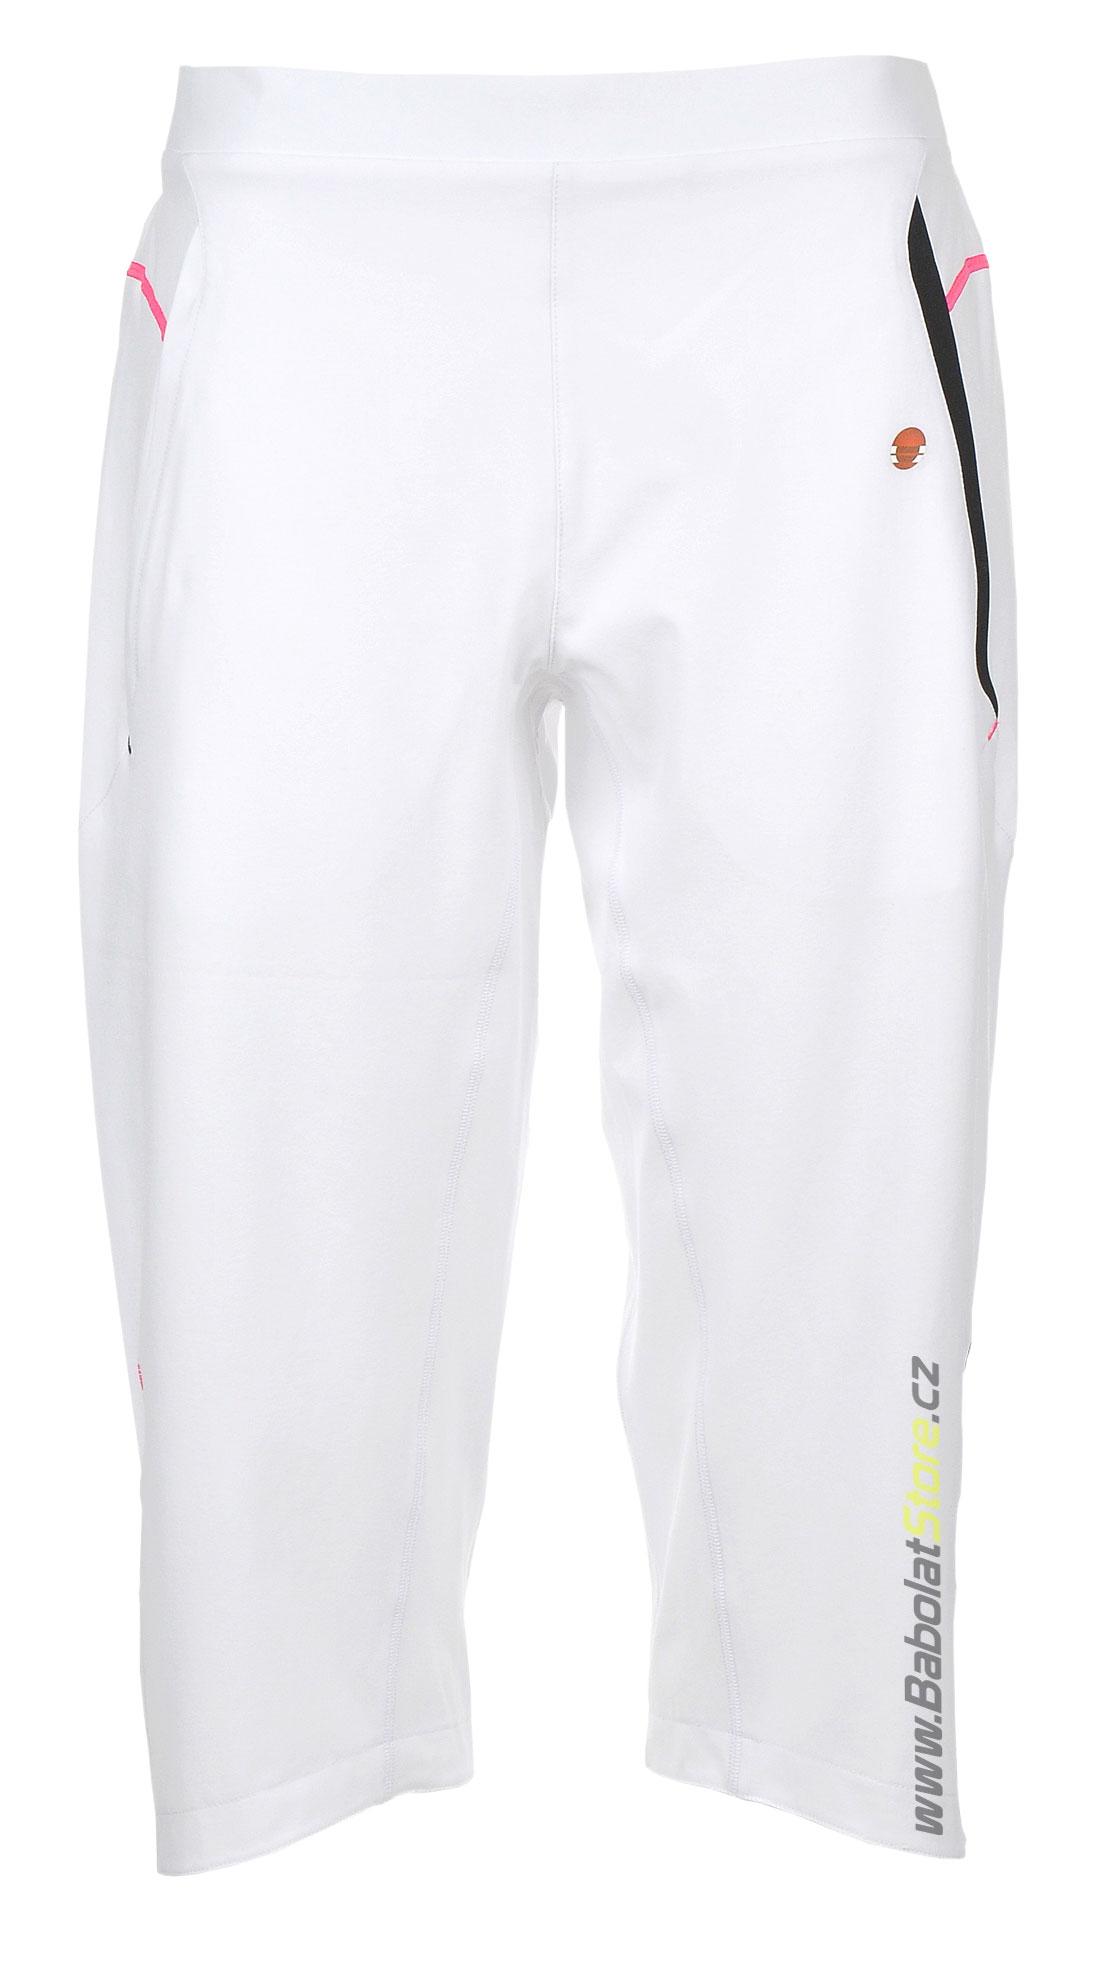 Babolat 3/4 Pant Women Performance White 2012/2013 S